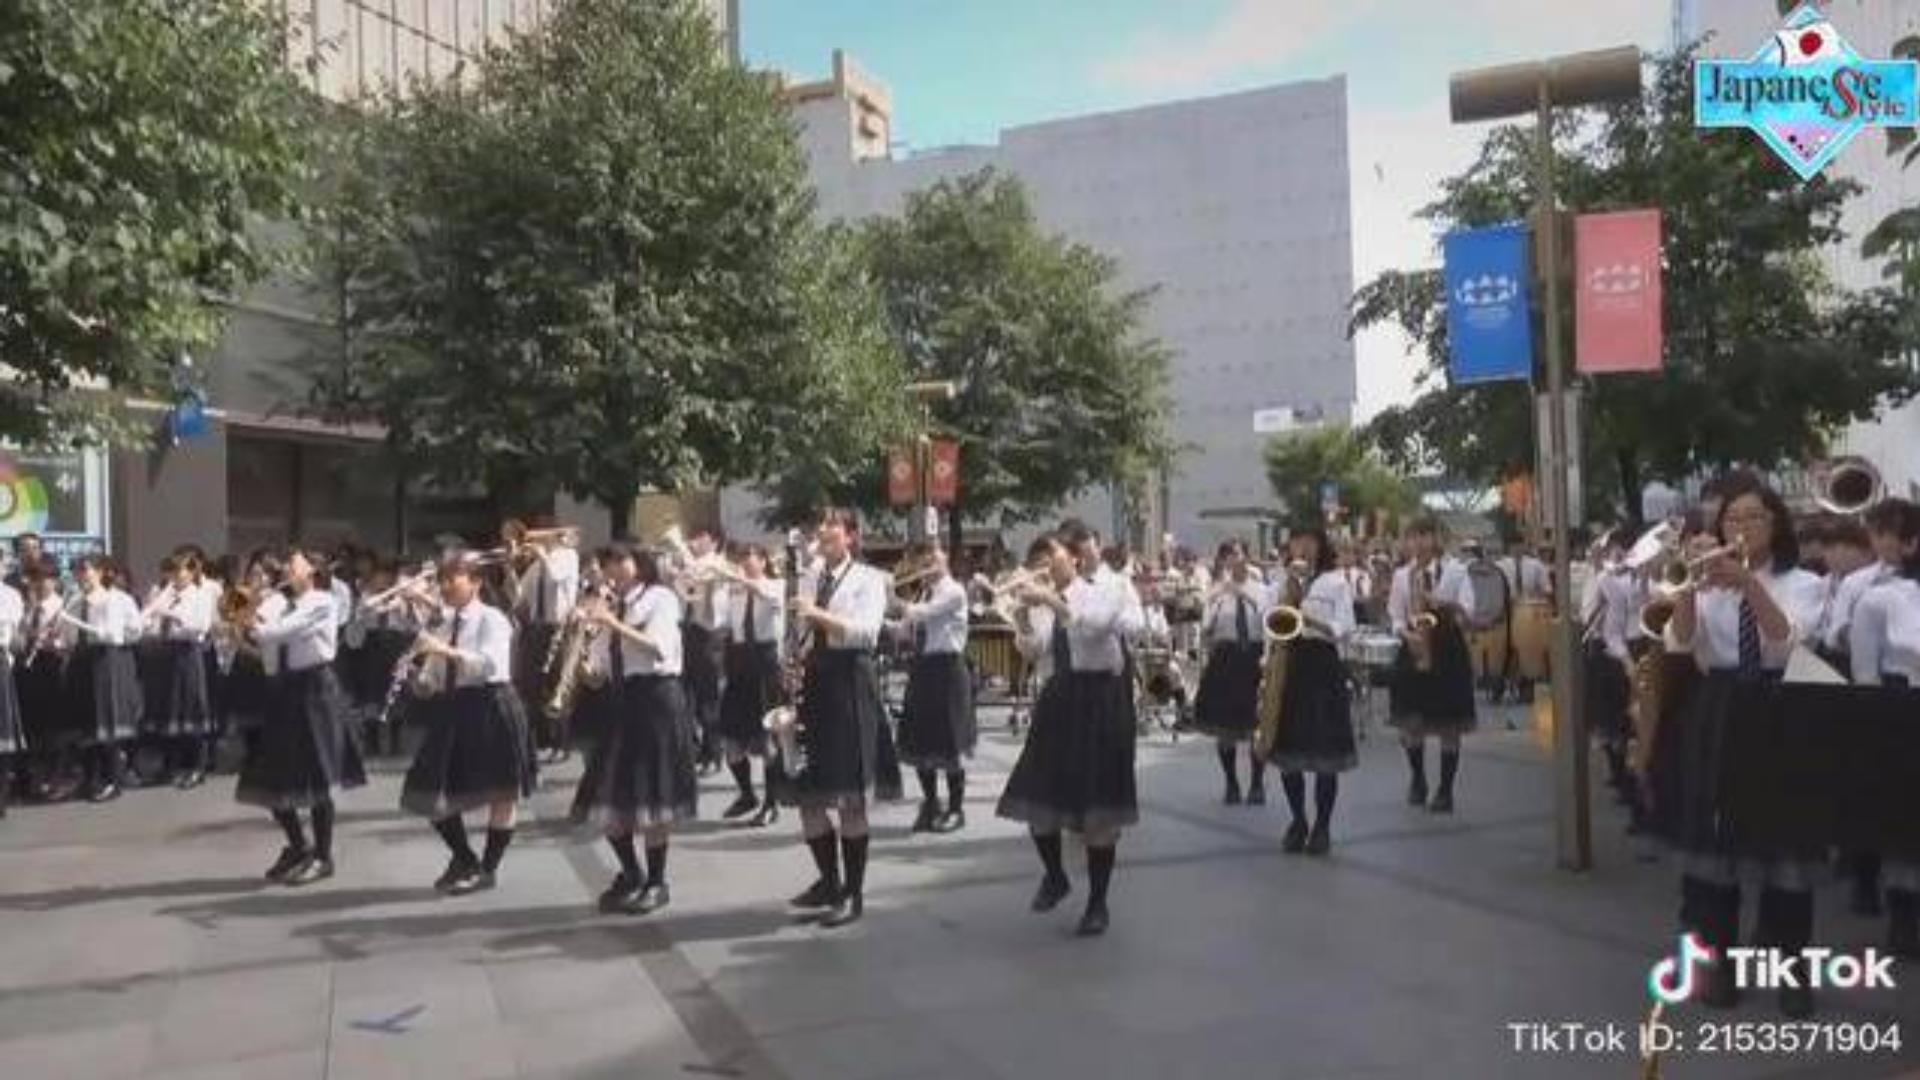 【Tik Tok 精选】日本的高中生活系列Part6